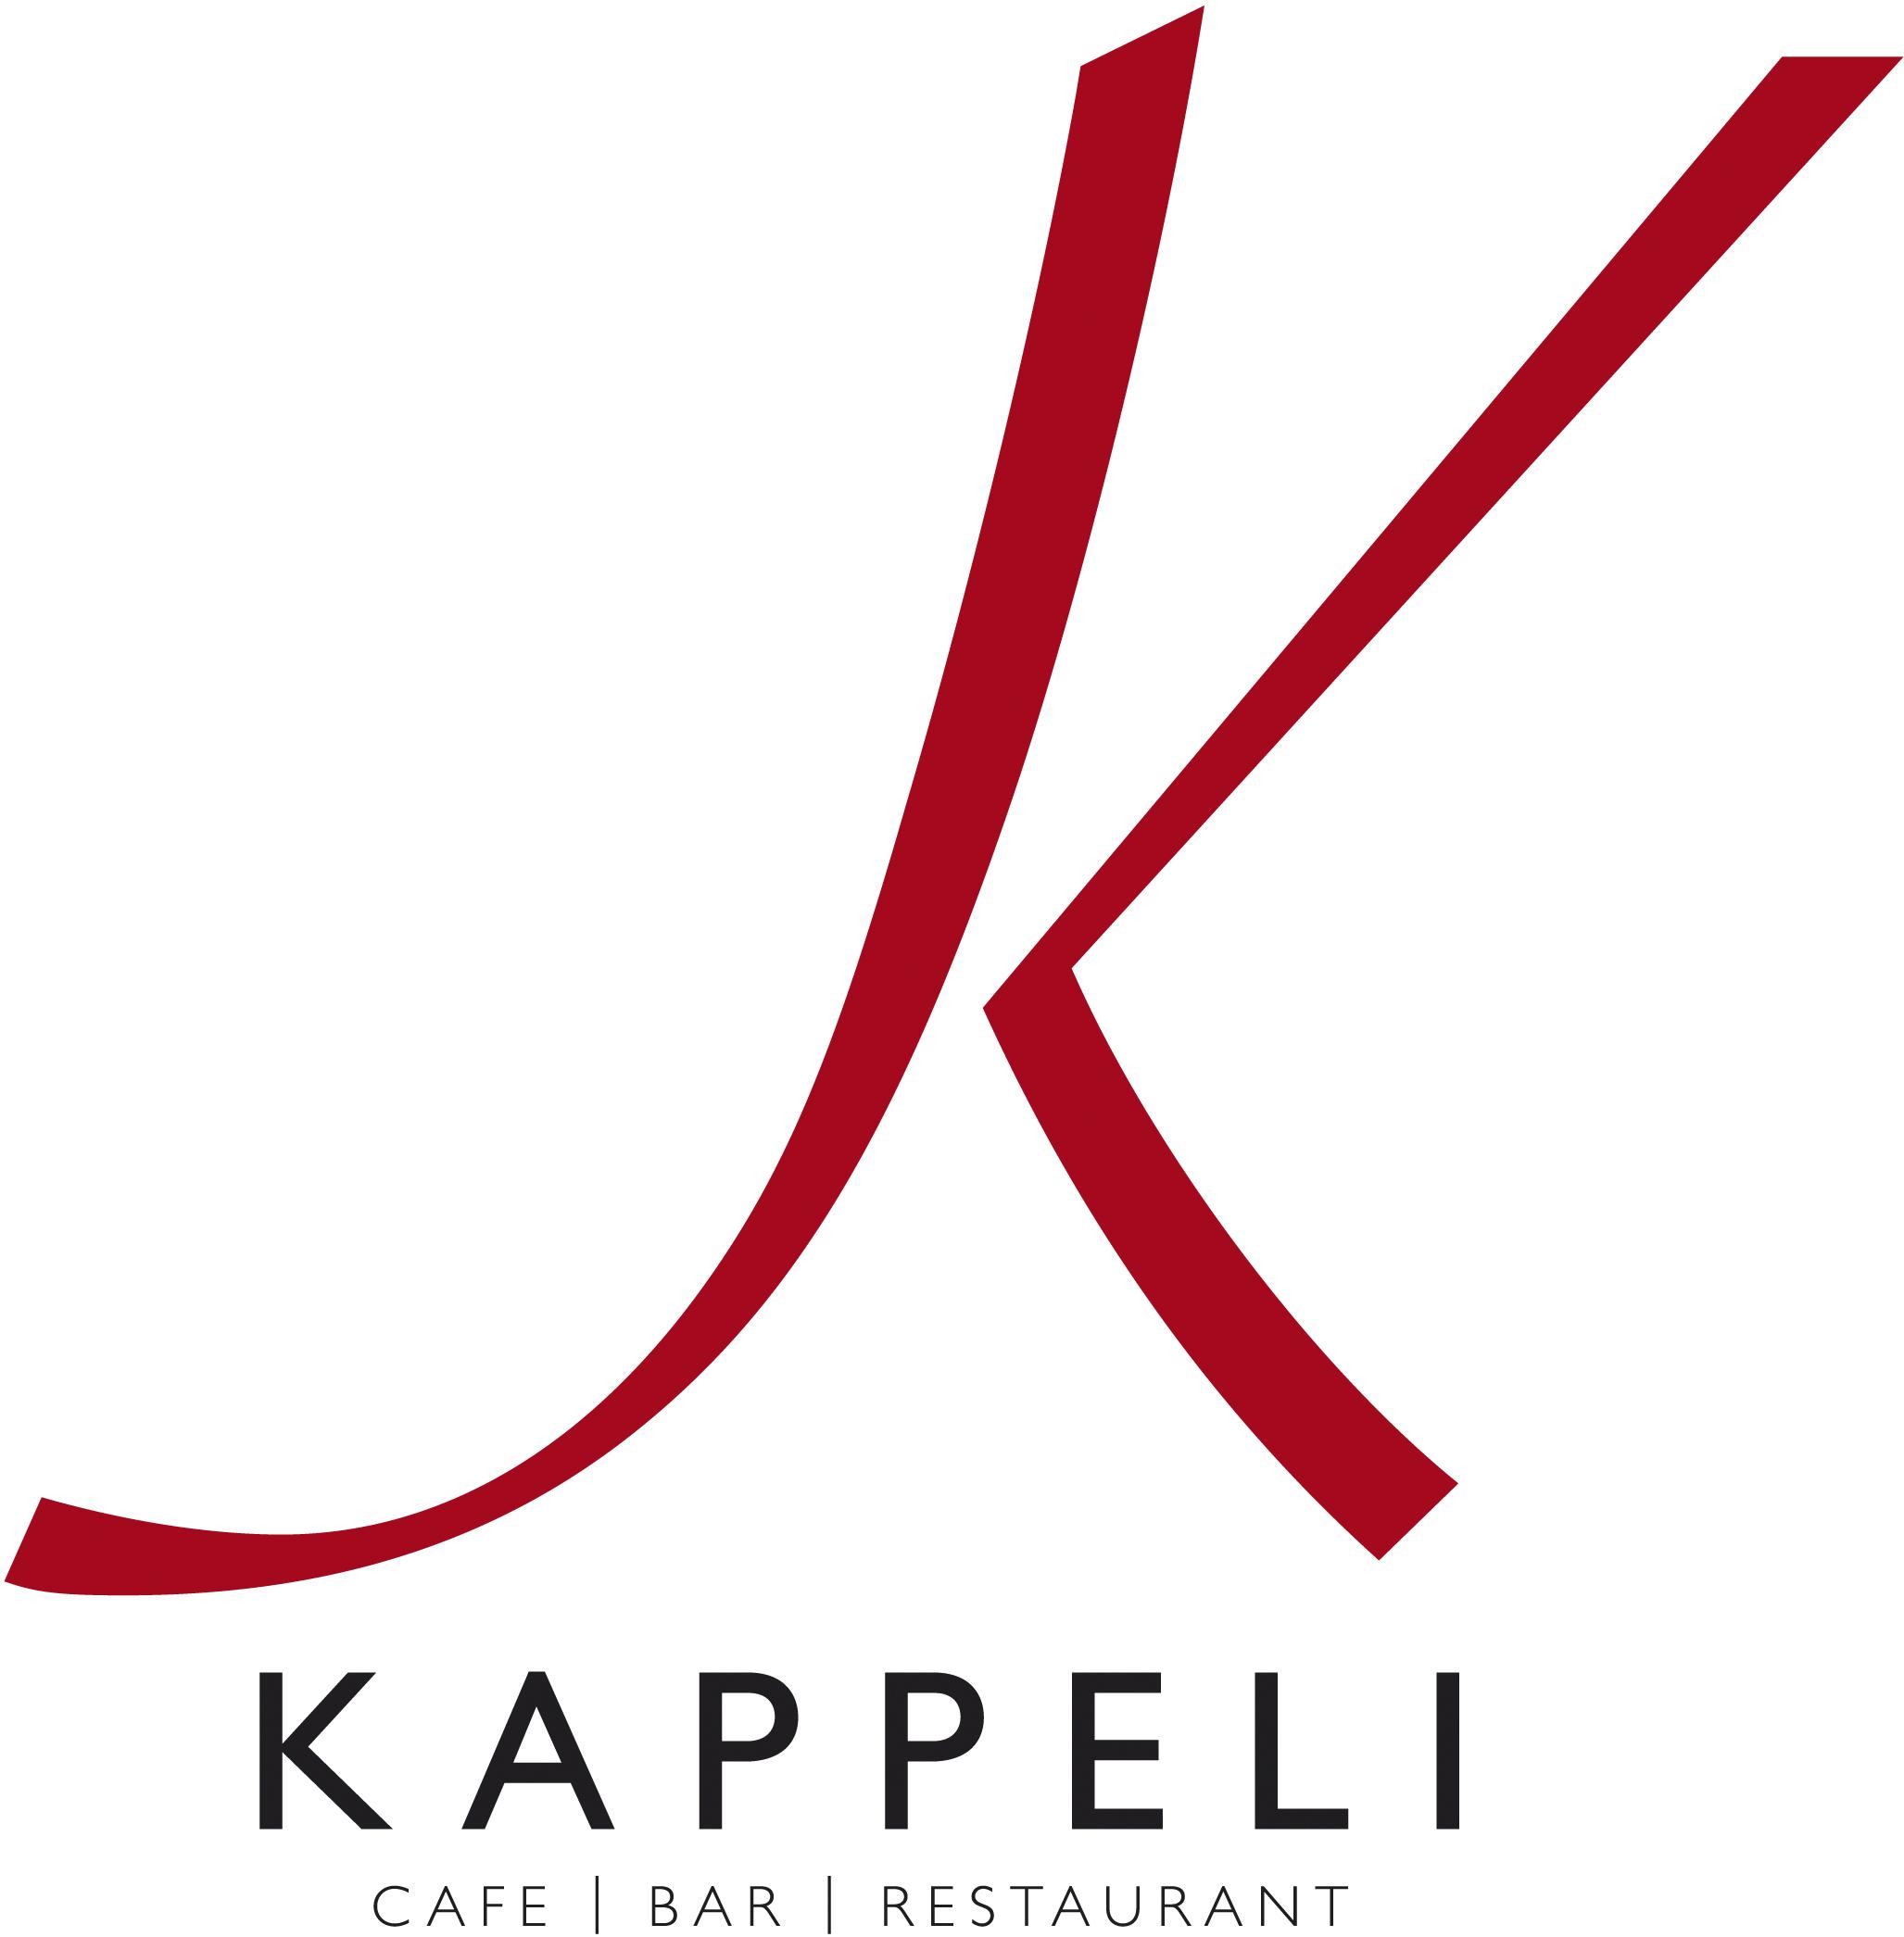 KAPPELI-logo_rgb.jpg